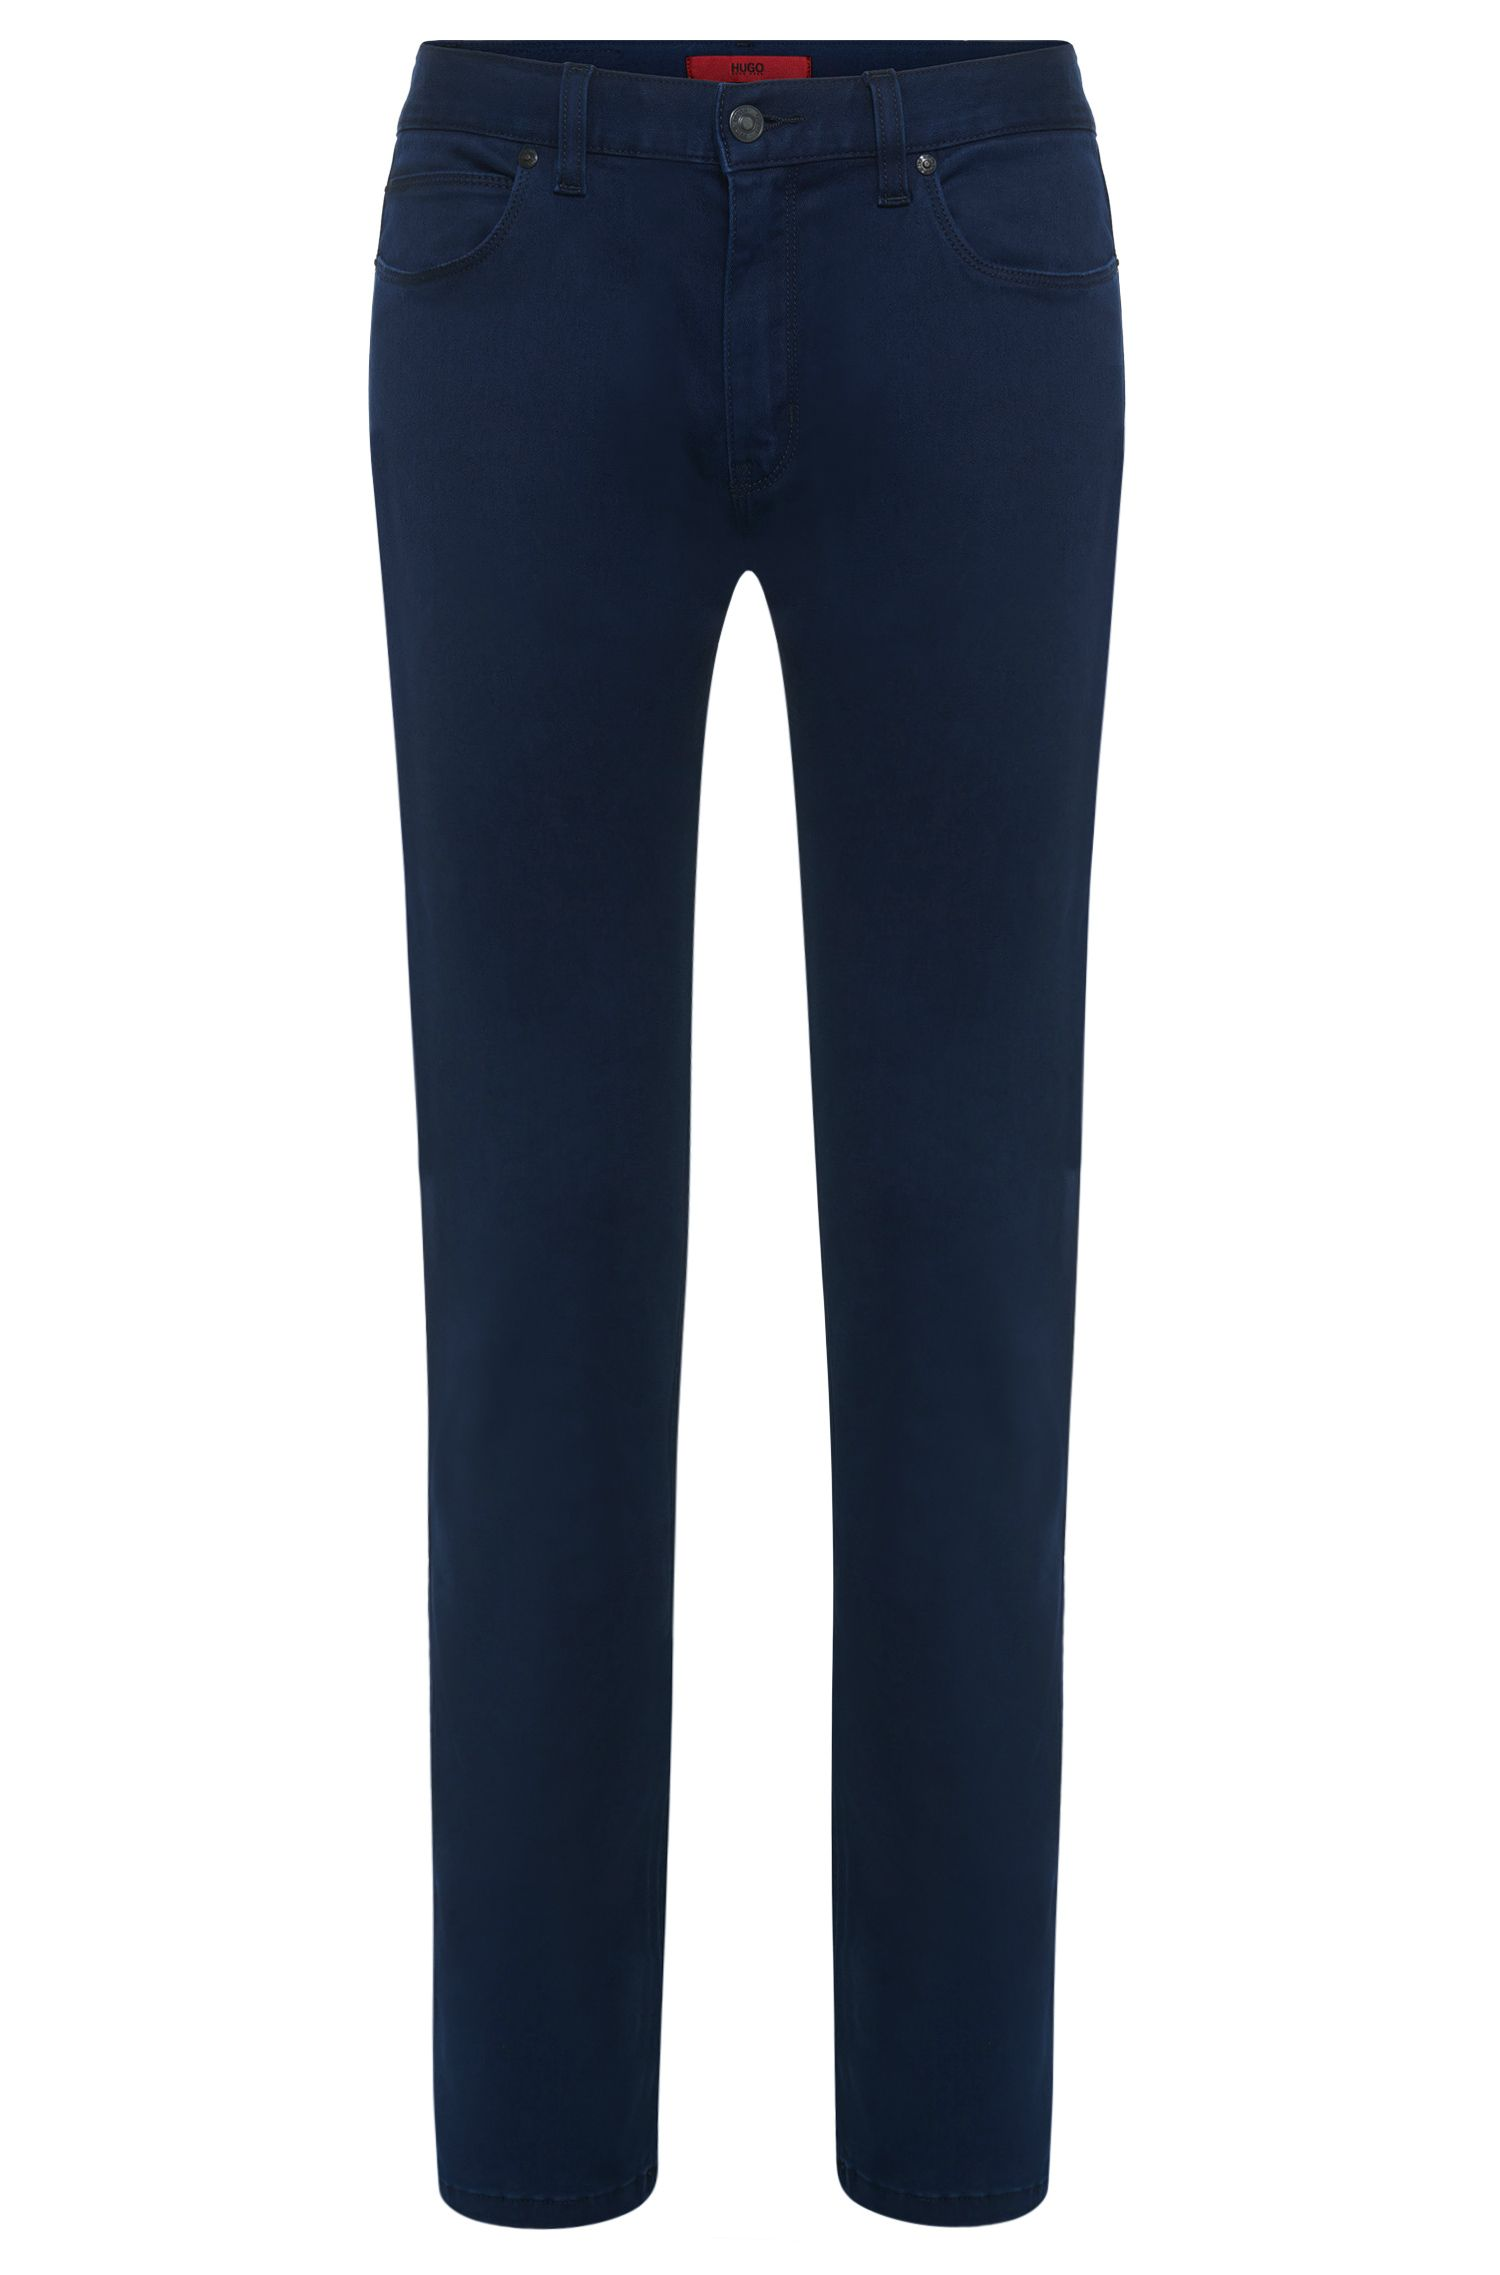 'HUGO 708' | Slim Fit, 11.75 oz Stretch Cotton Blend Jeans